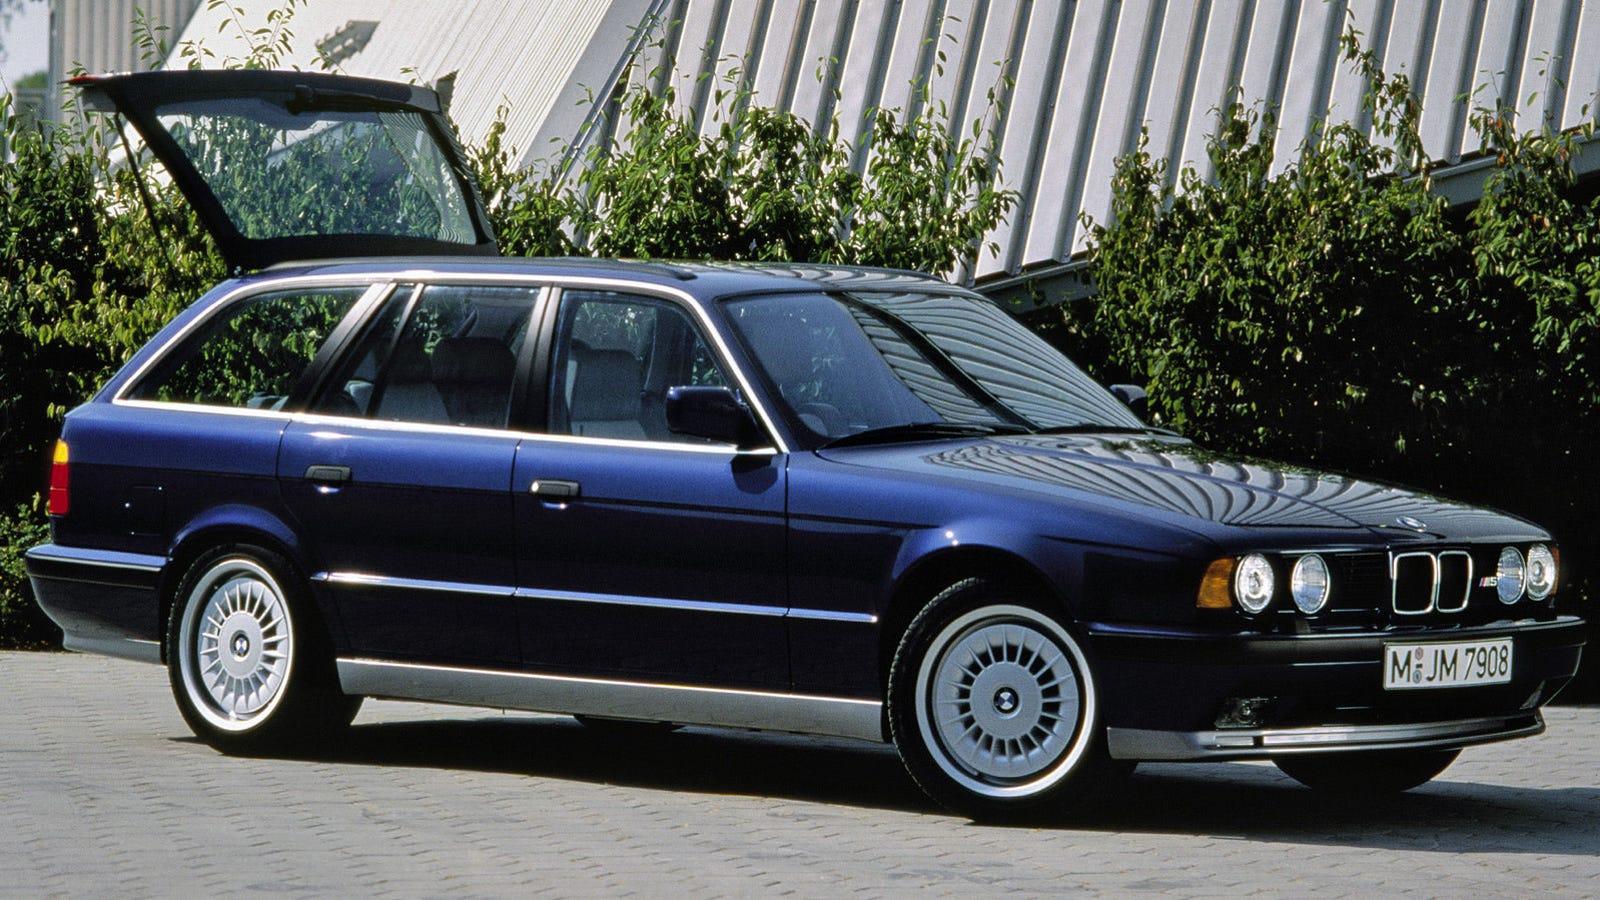 The Lord of the Wagons Is a BMW E34 M5 With the V12 From a McLaren F1